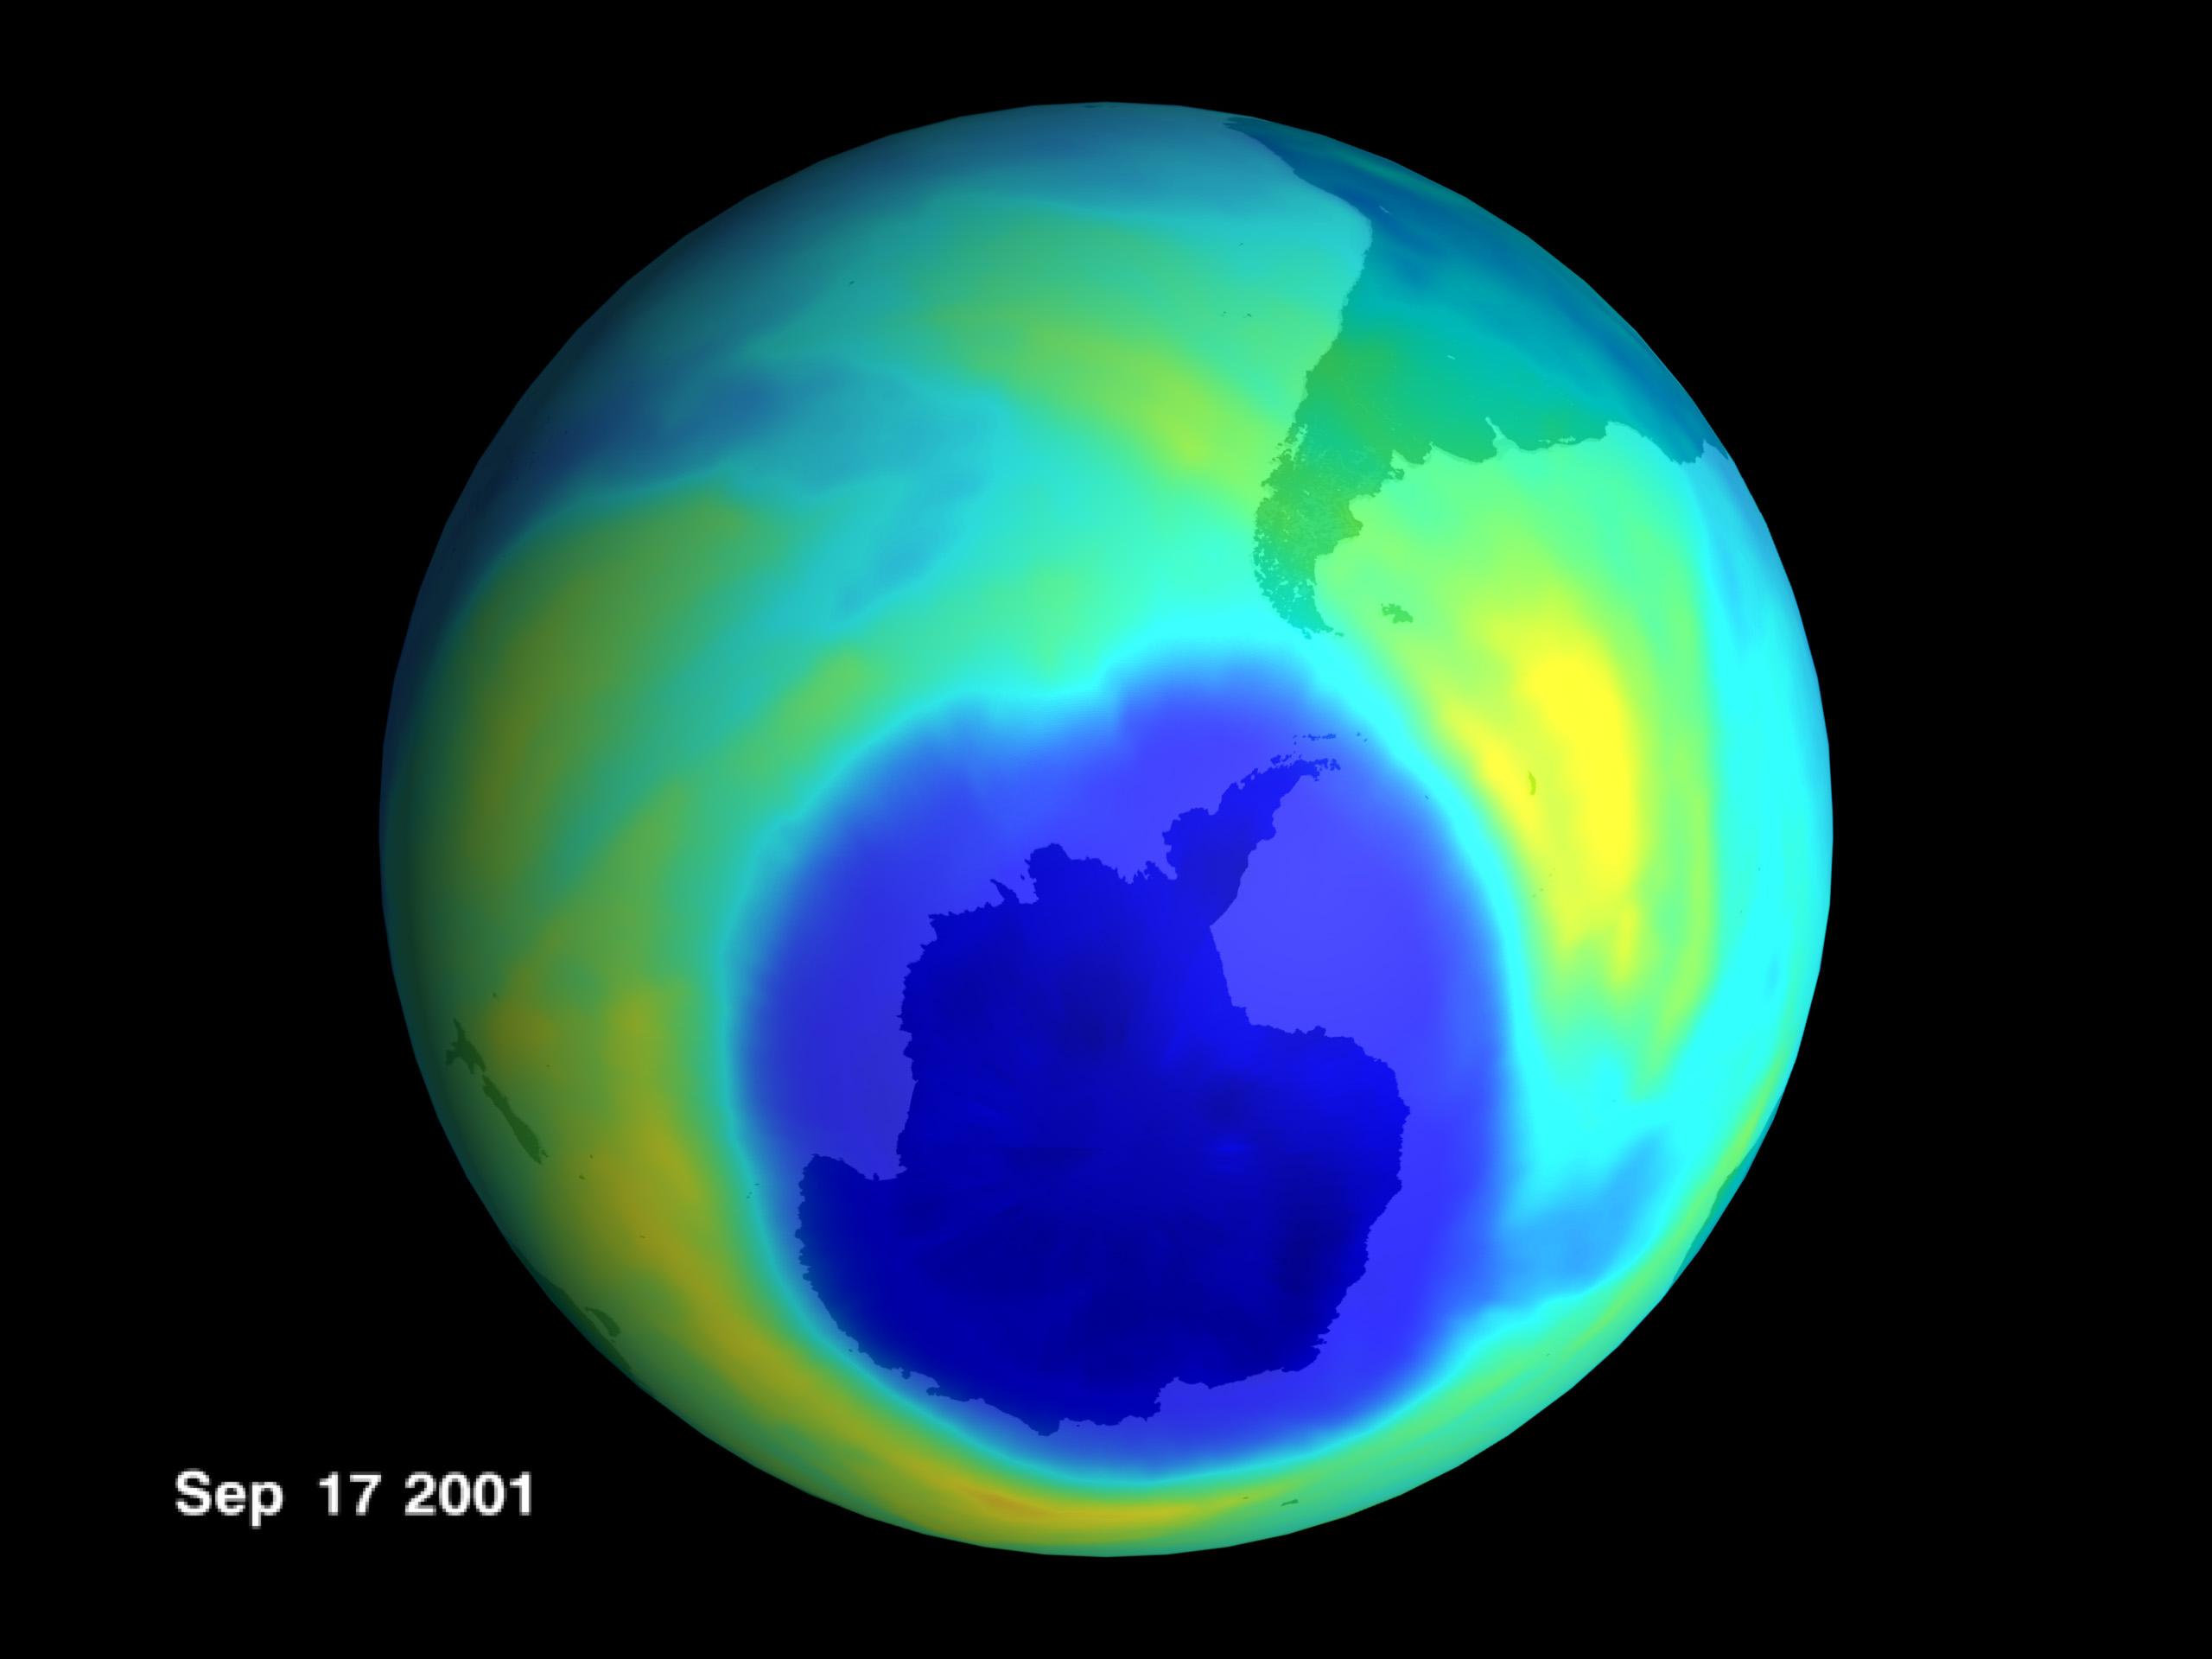 Ozone hole in Antarctica September 17, 2001